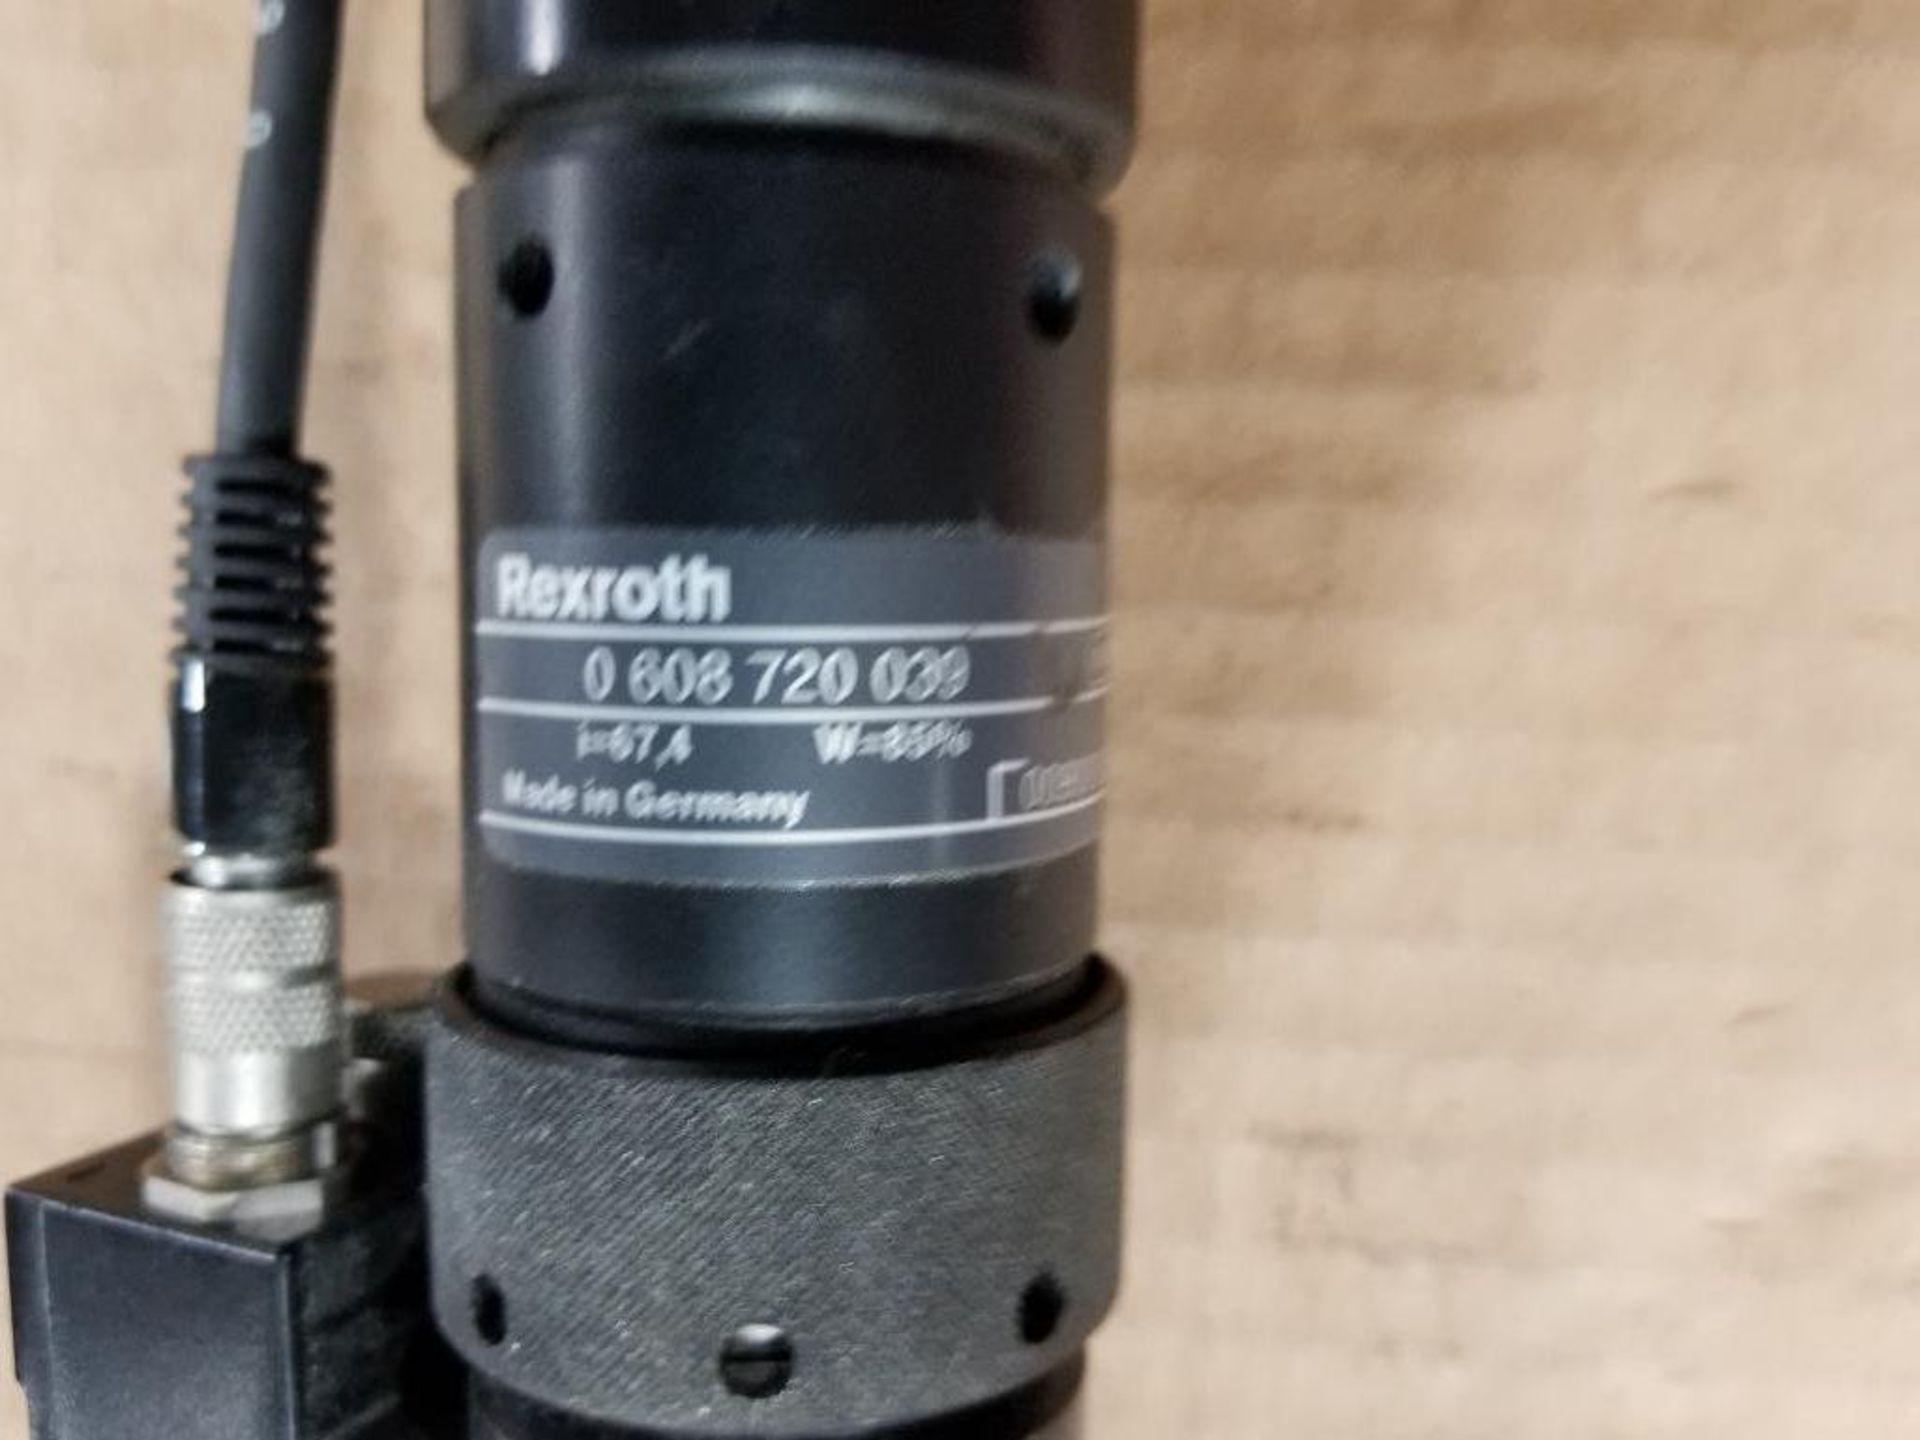 Rexroth 0-608-820-113 nutrunner. - Image 4 of 5